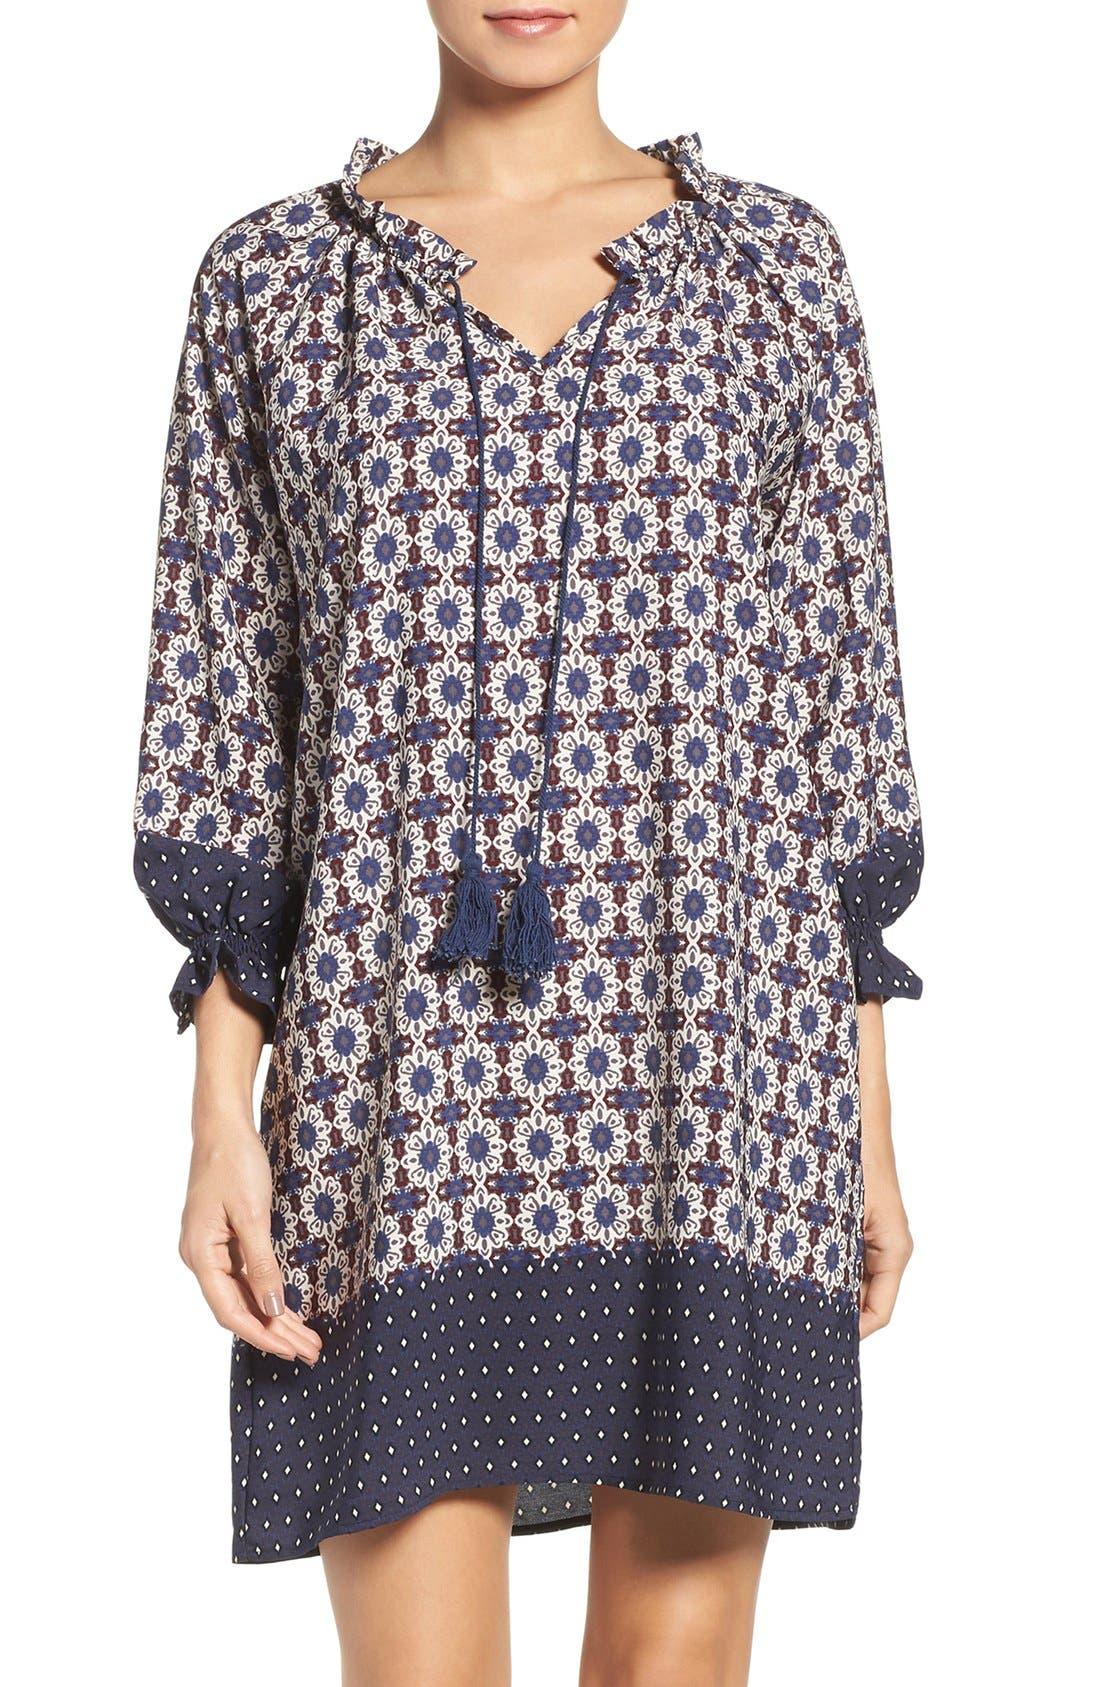 Catella Tunic Dress,                             Main thumbnail 1, color,                             410